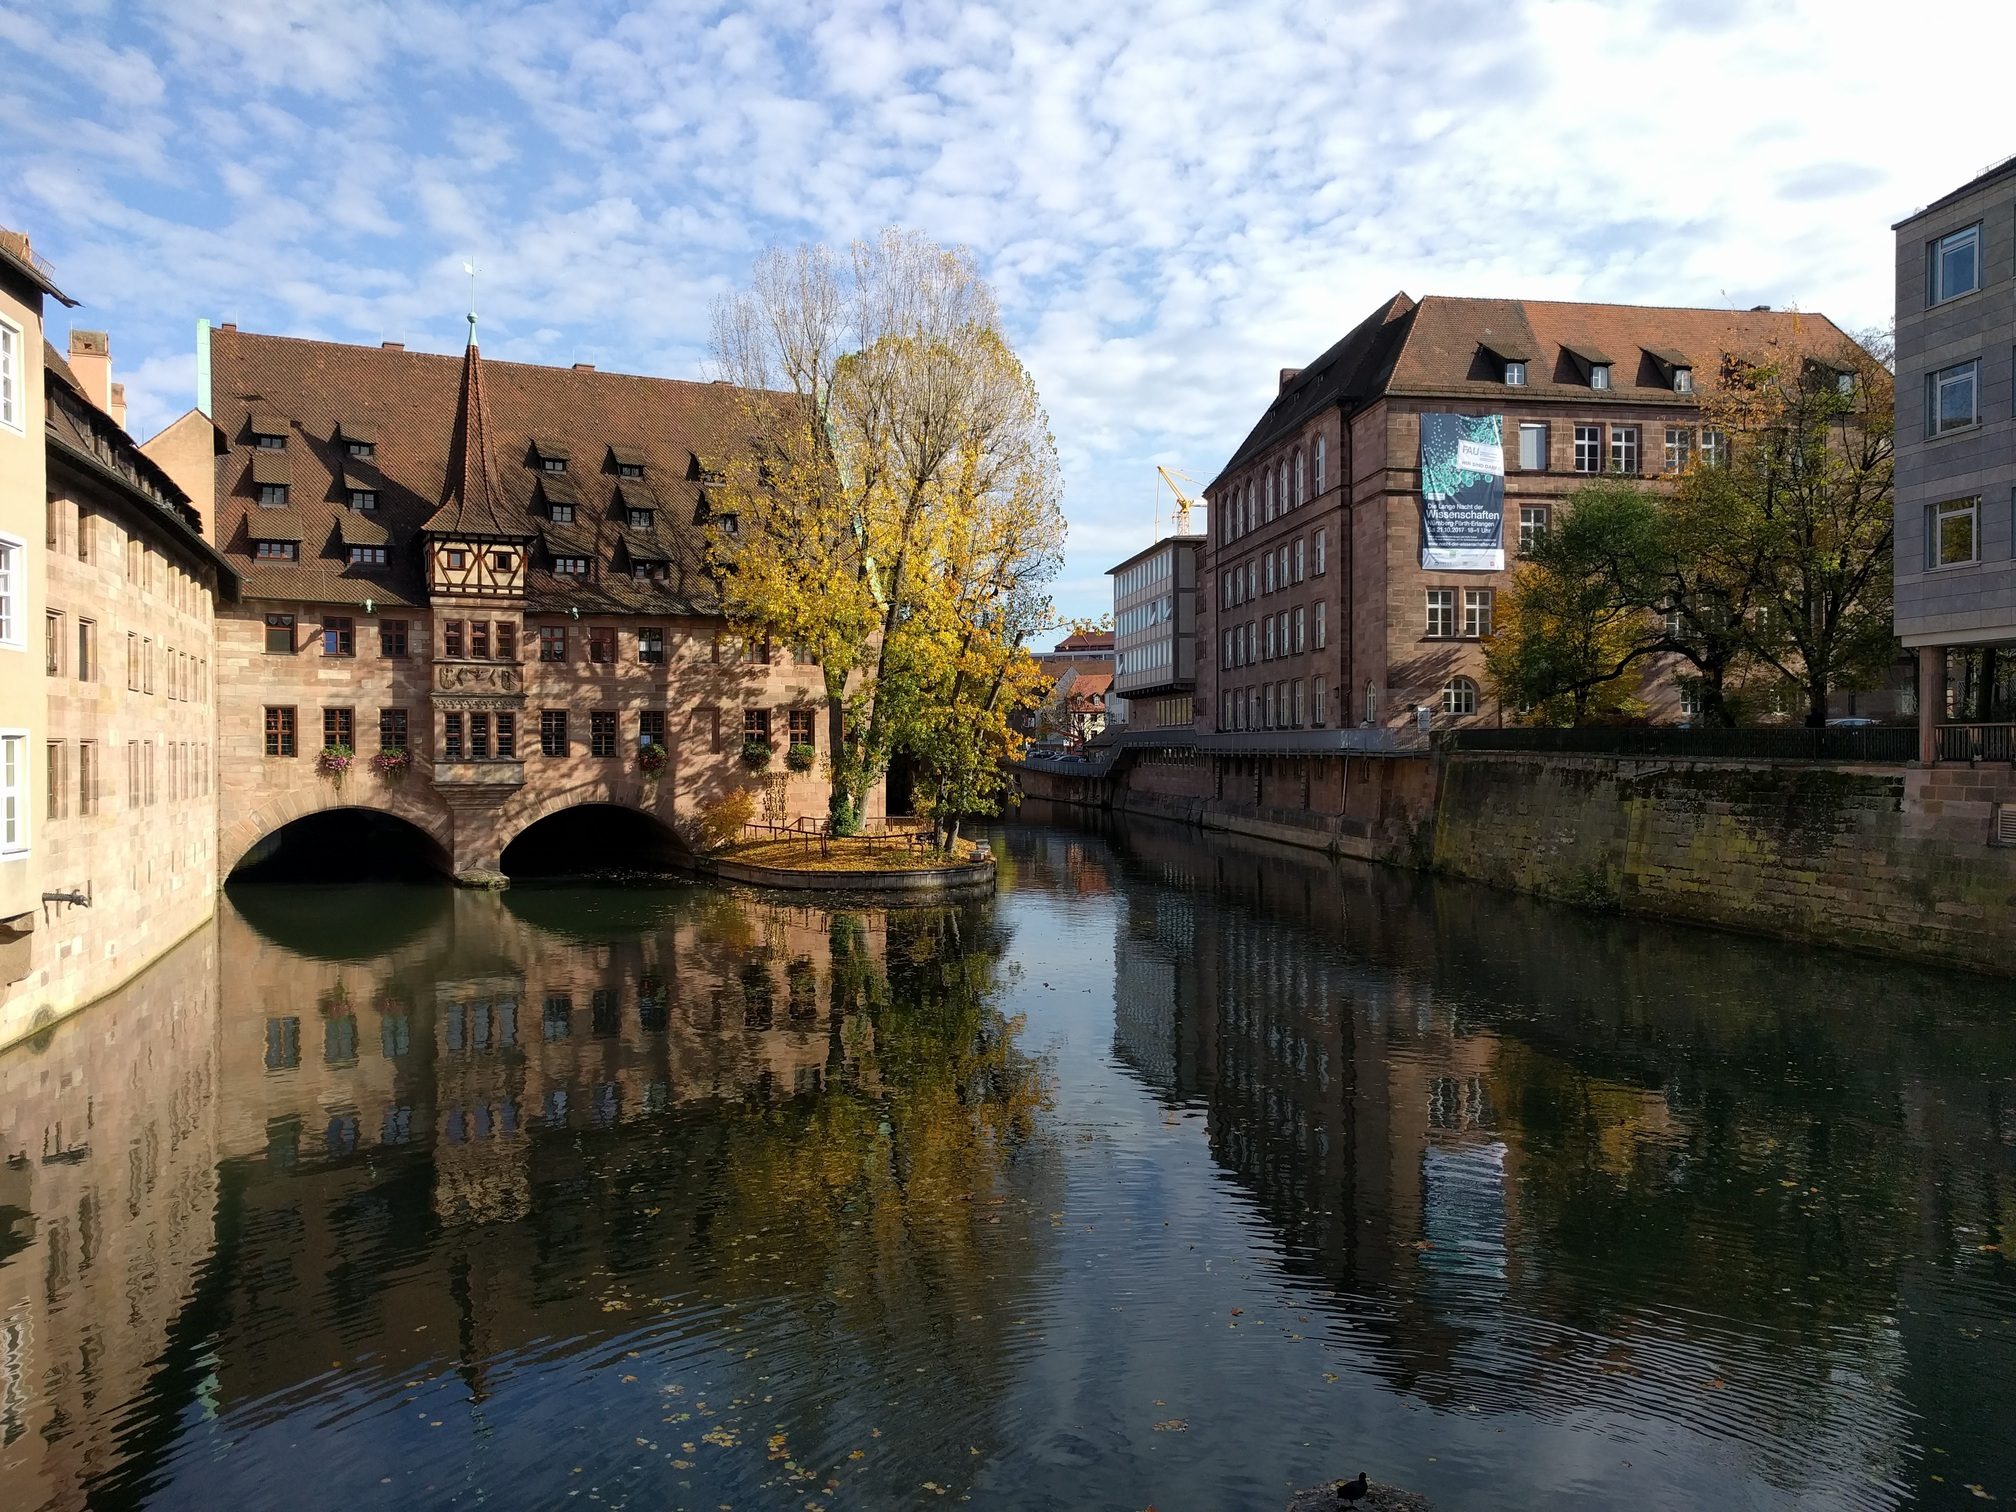 /images/Nuremburg.jpg